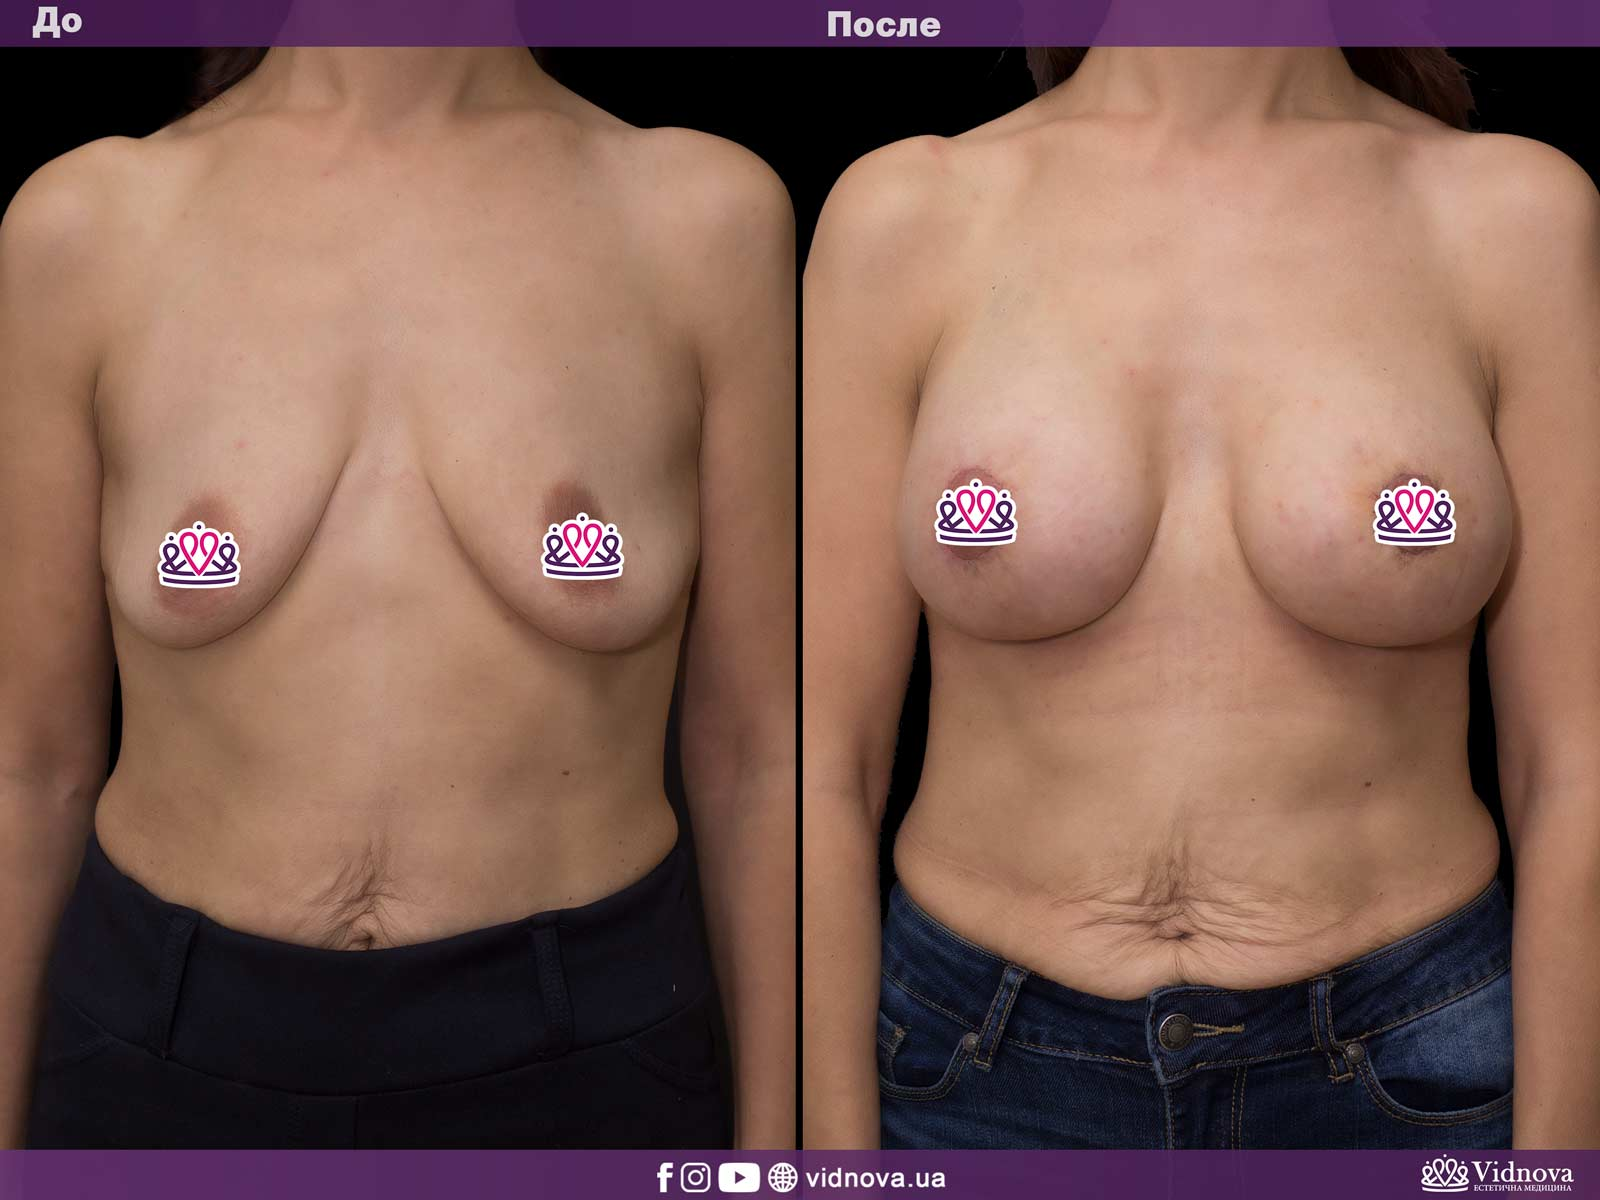 Подтяжка груди: Фото ДО и ПОСЛЕ - Пример №16-1 - Клиника Vidnova